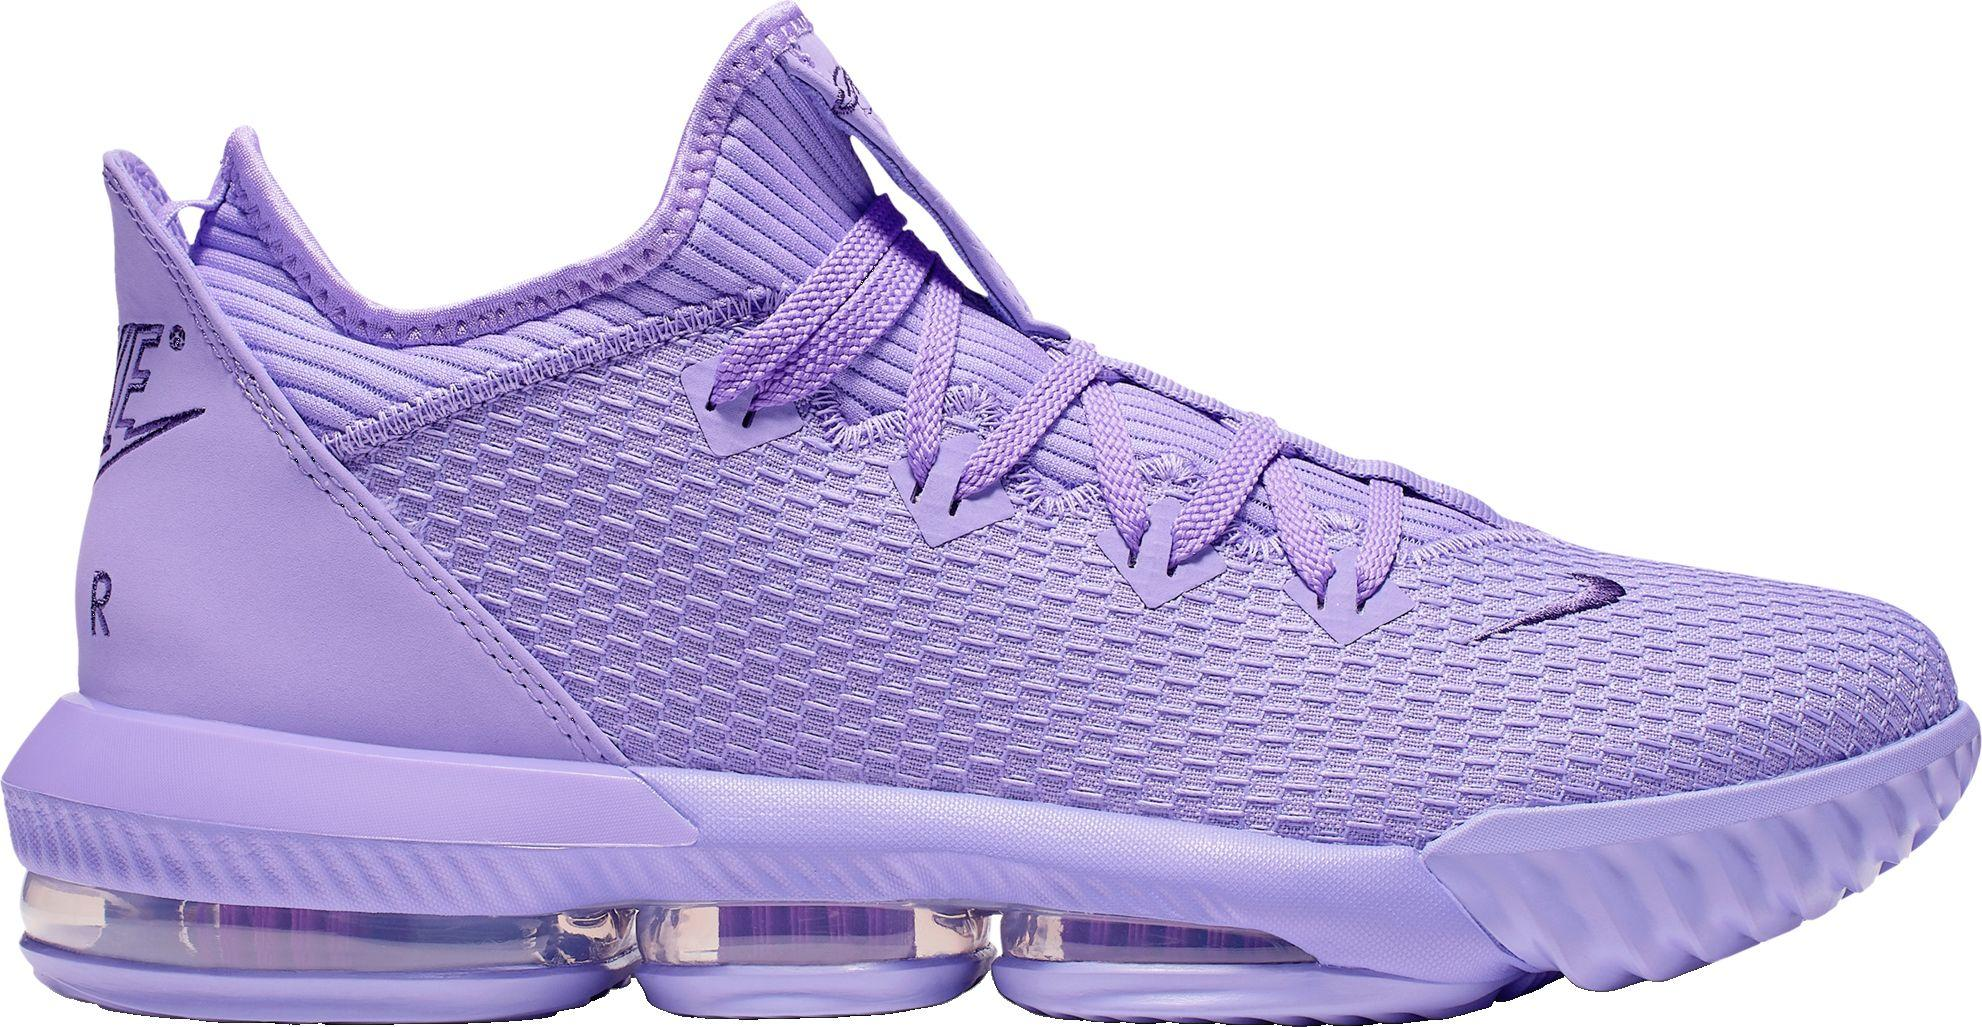 Nike Lebron 16 Low Basketball Shoe in